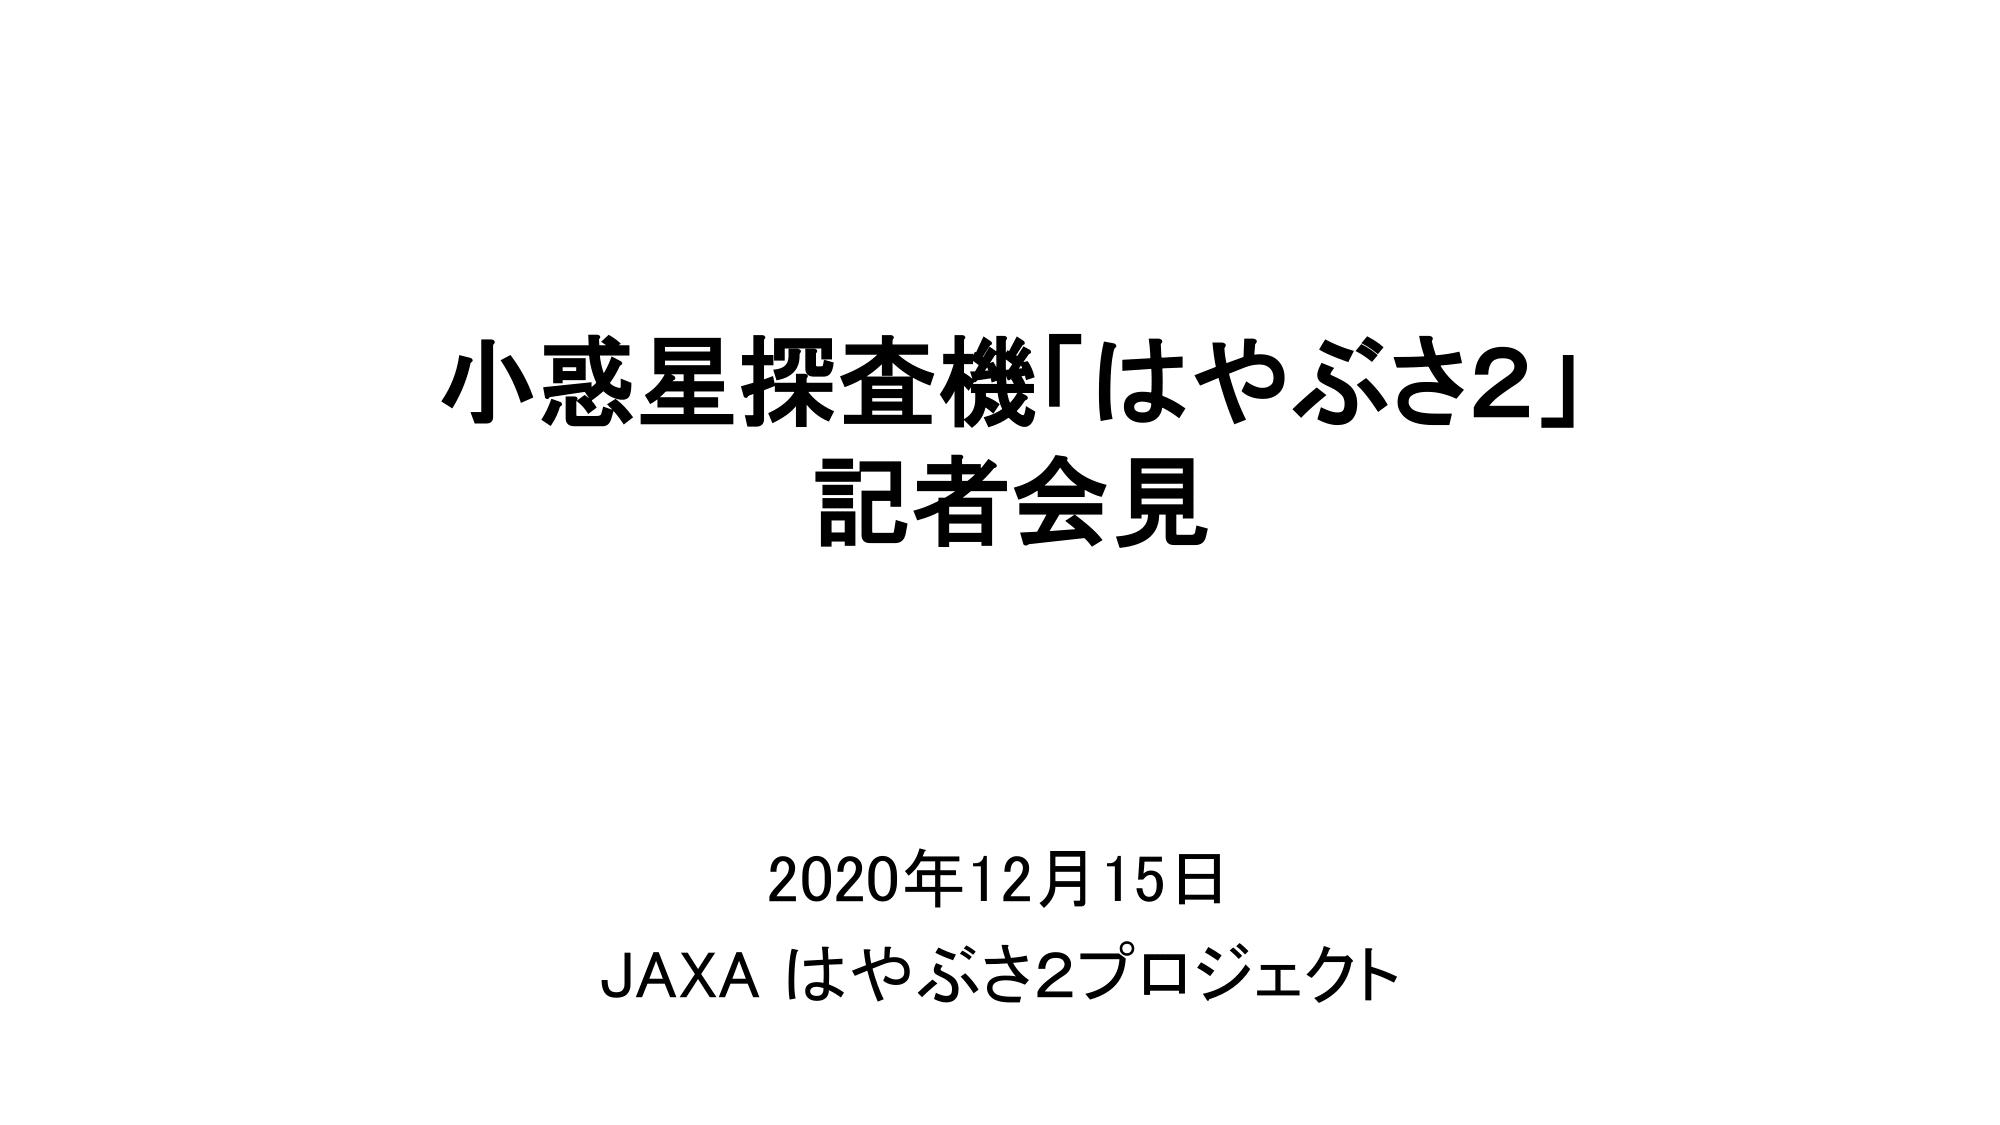 f:id:Imamura:20201215131948p:plain